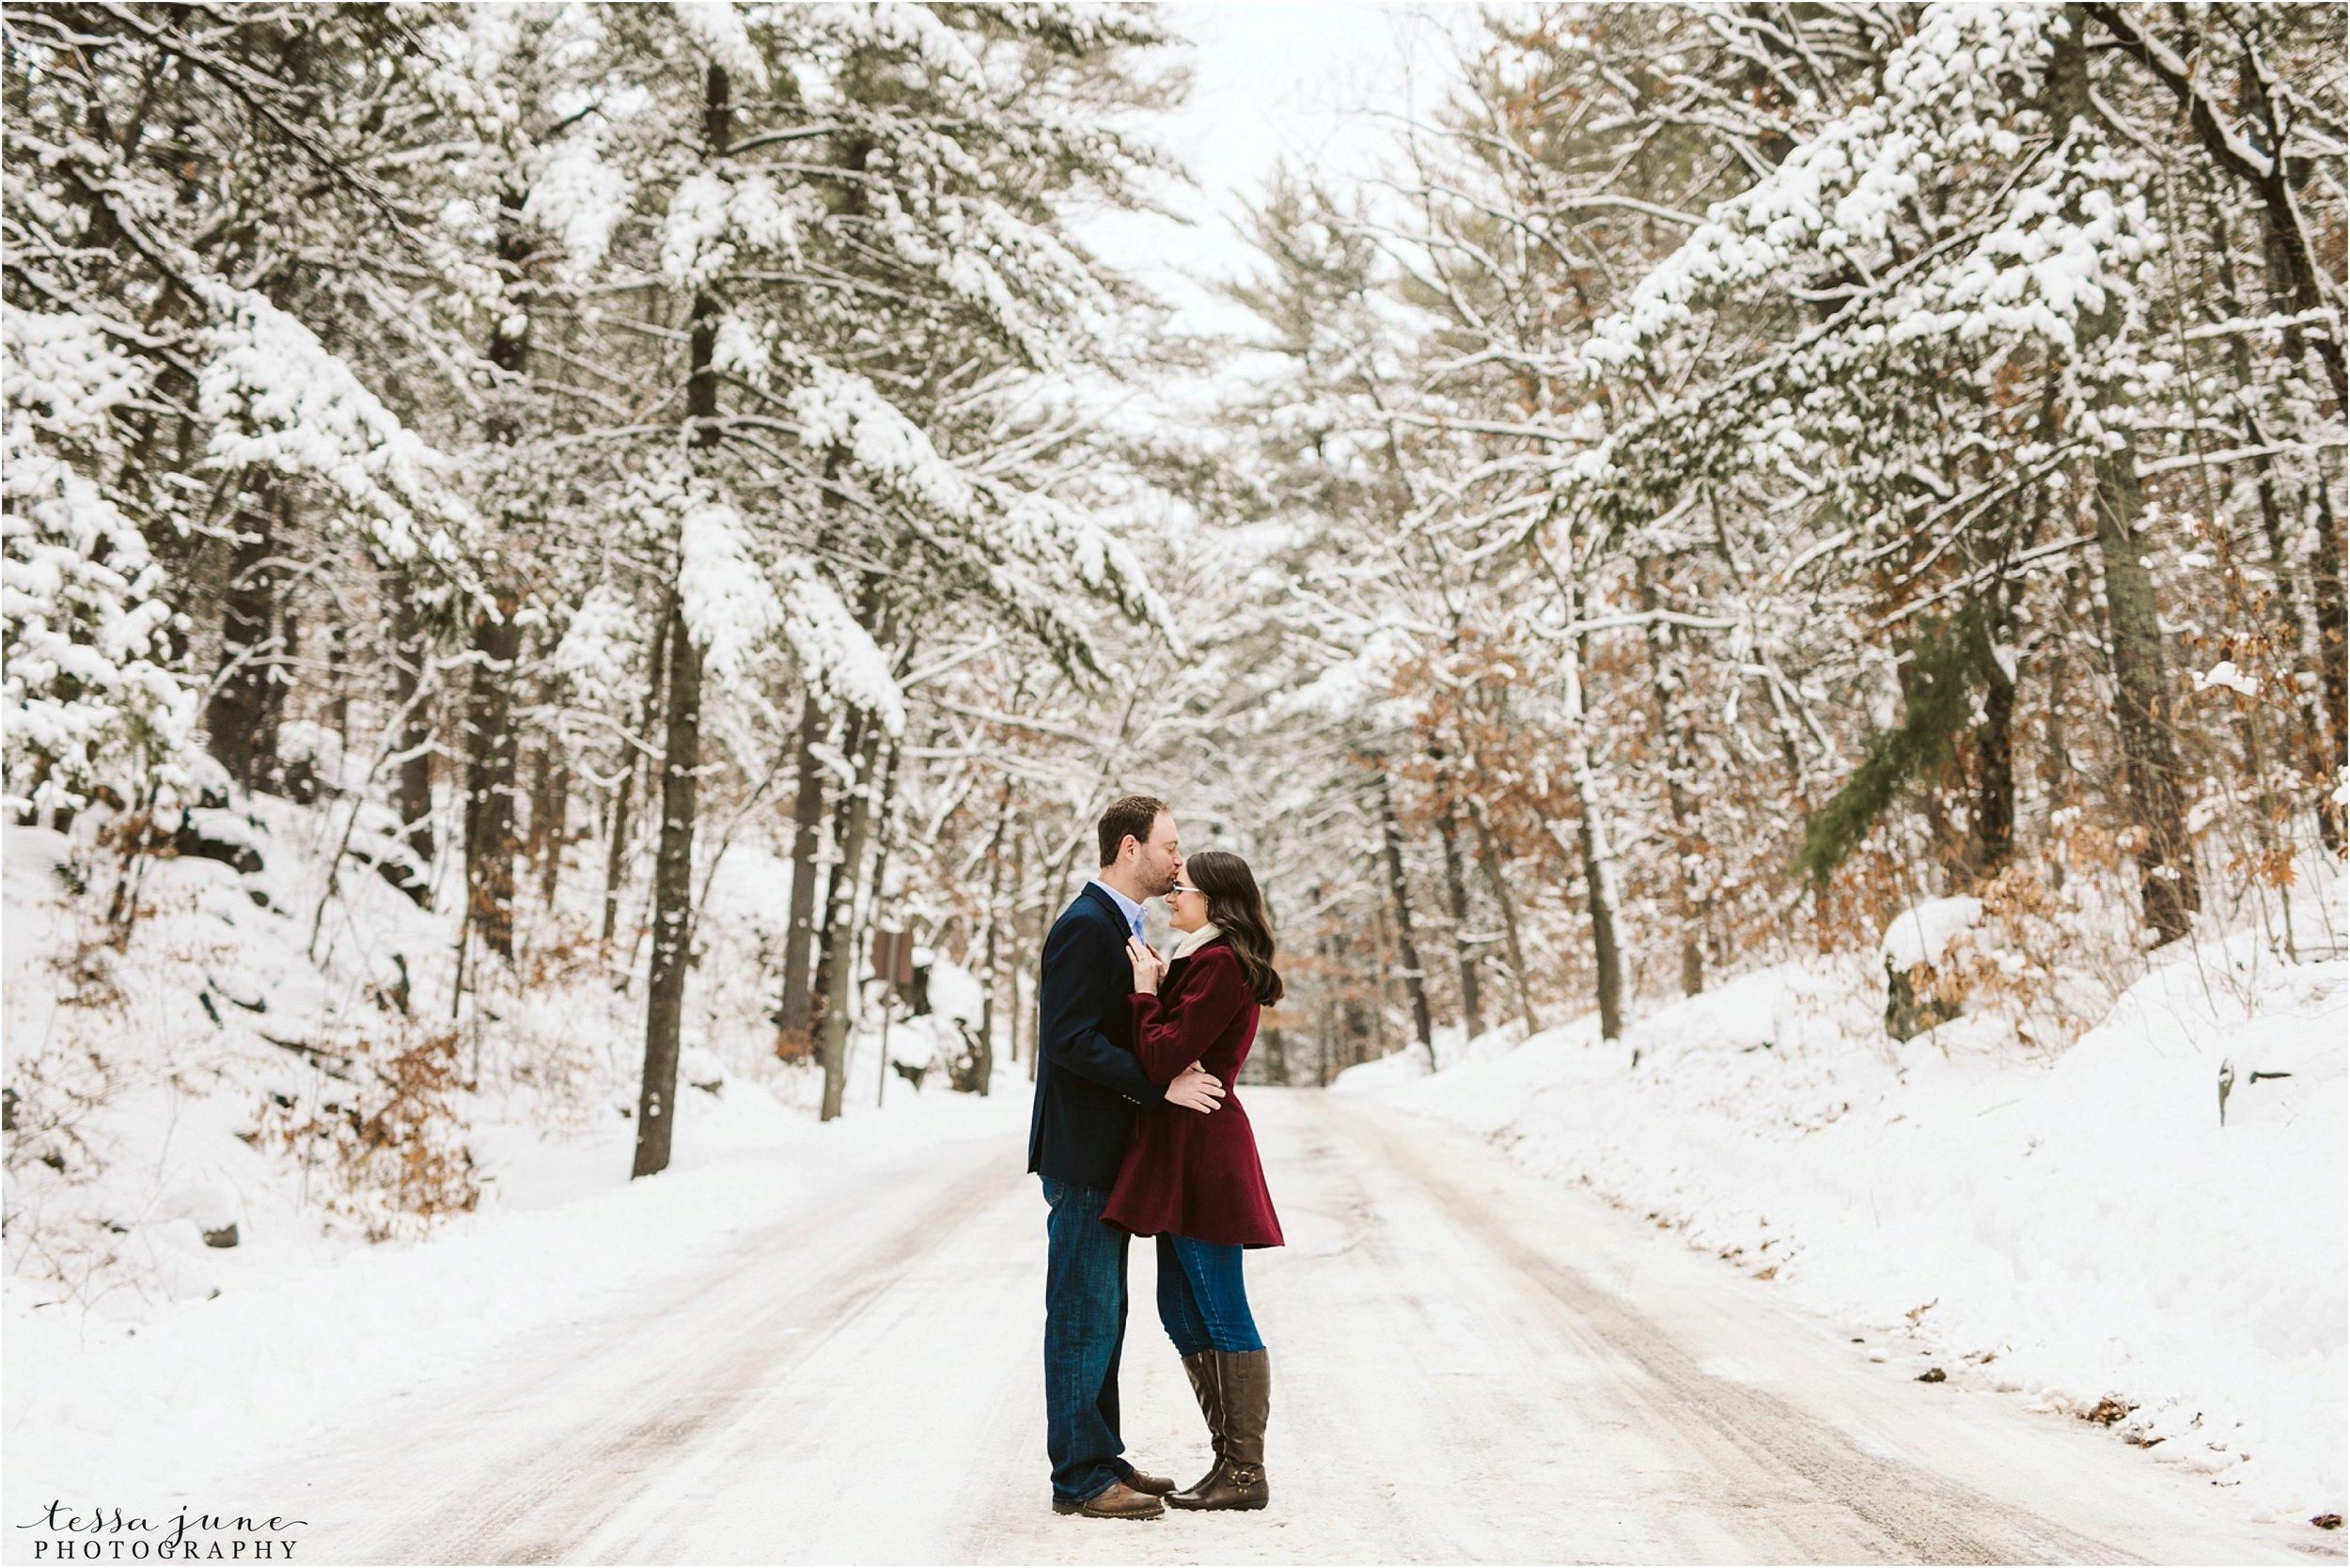 taylors-falls-winter-engagement-session-st-cloud-photographer-2.jpg